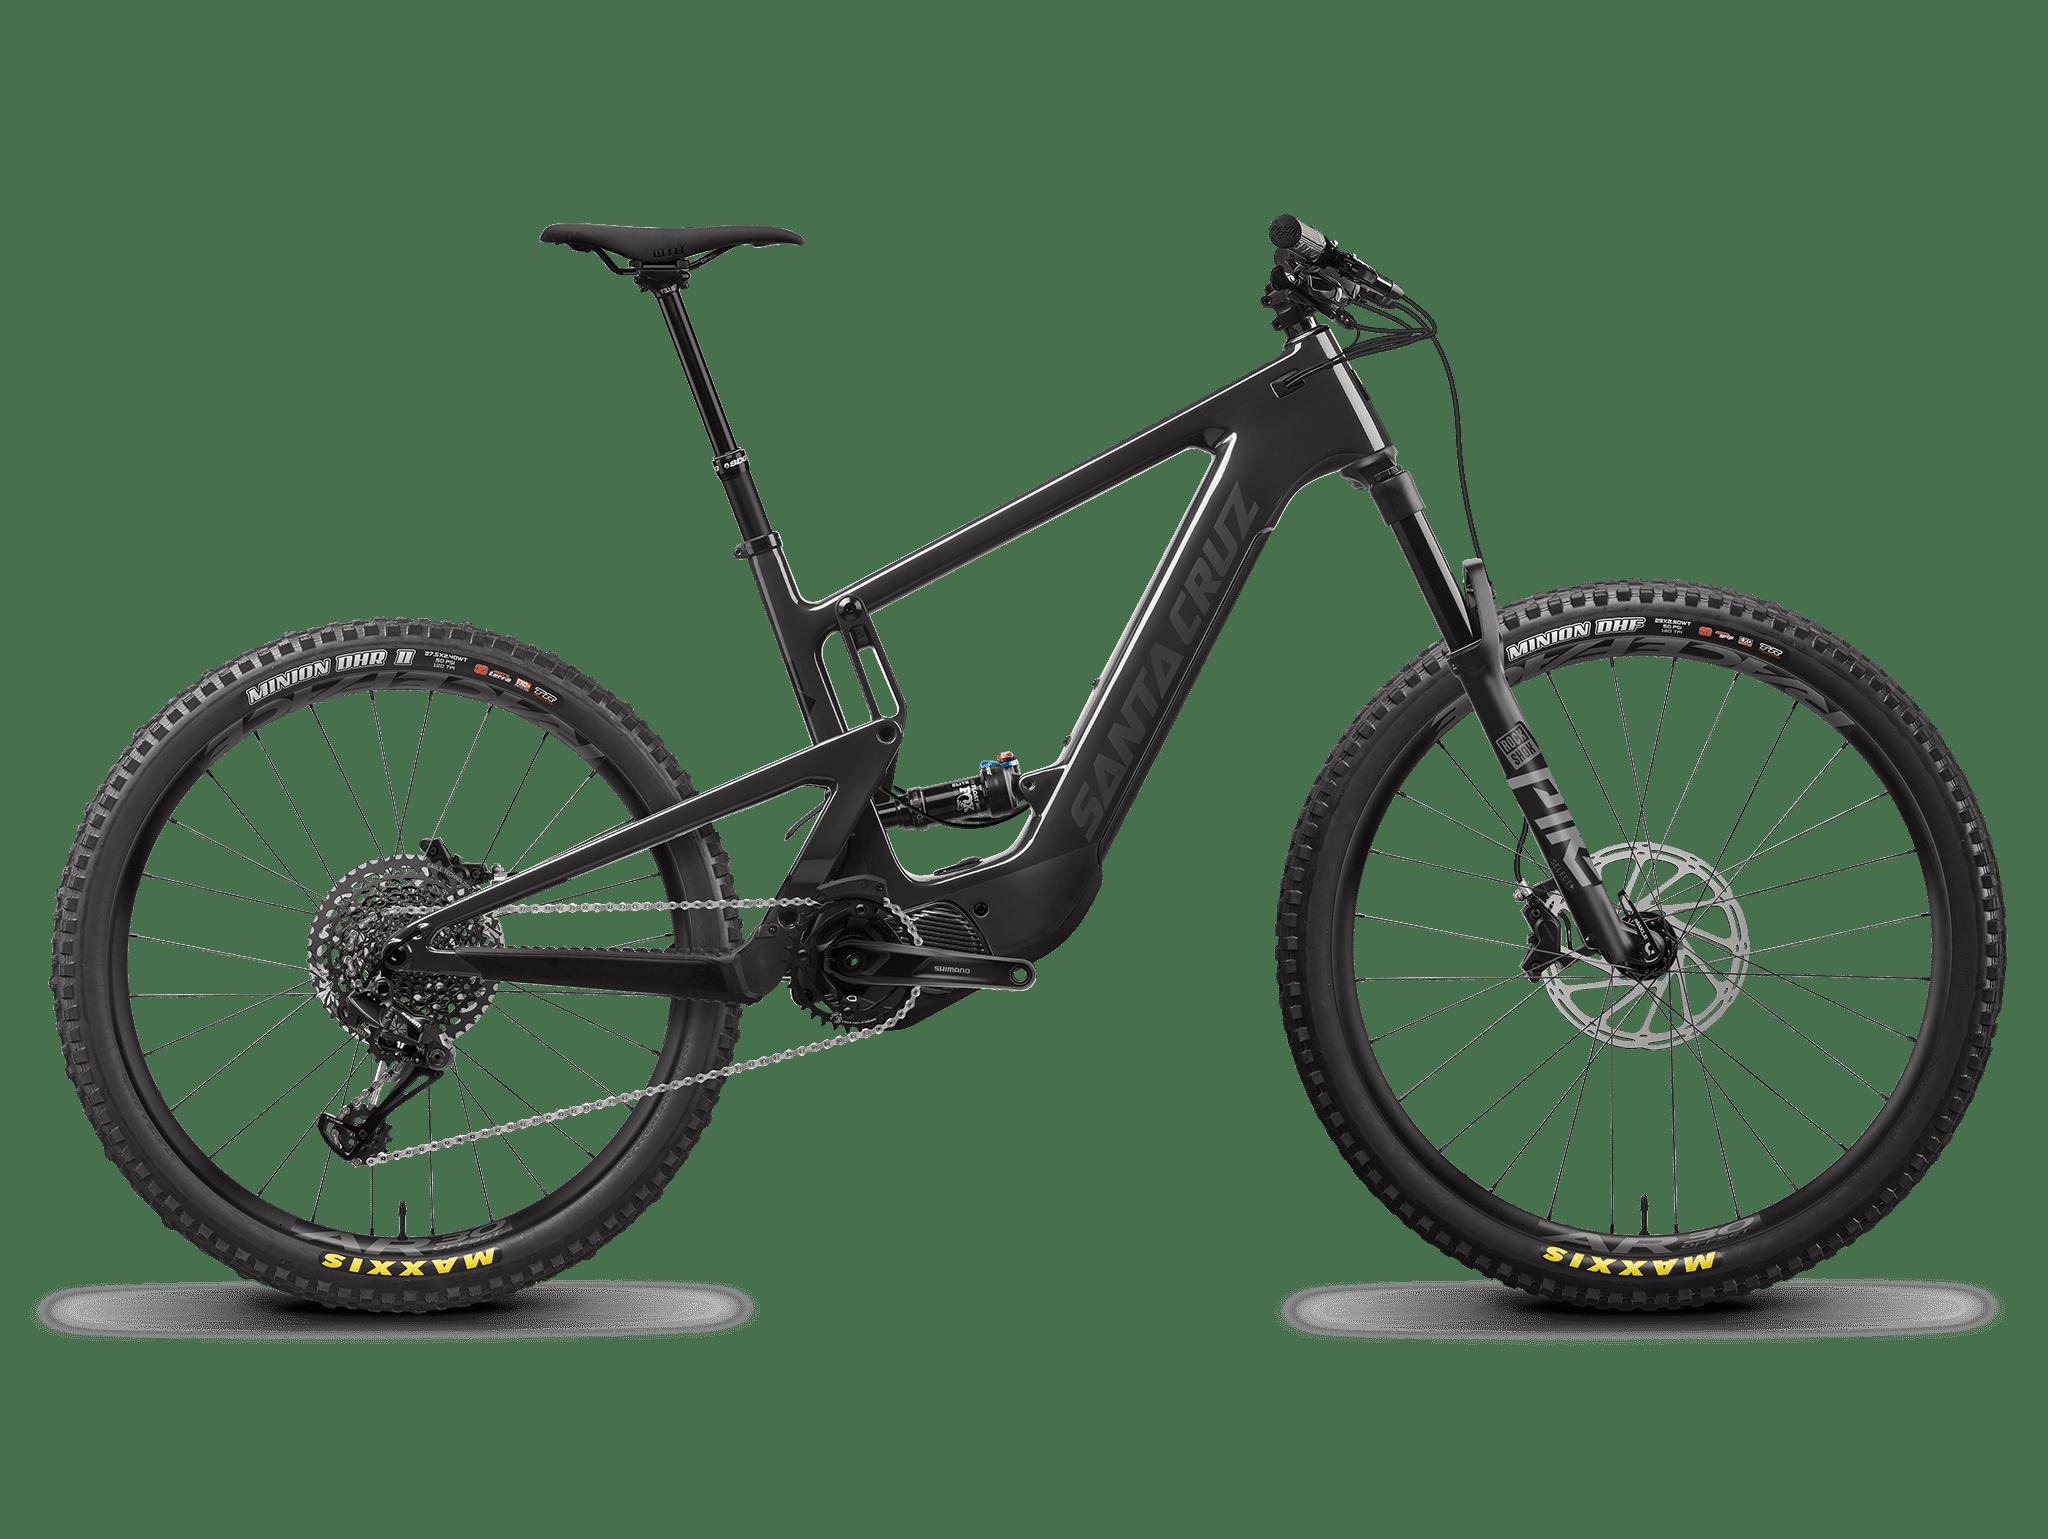 Image of Santa Cruz Heckler Mx S Electric Mountain Bike 2022 Carbon